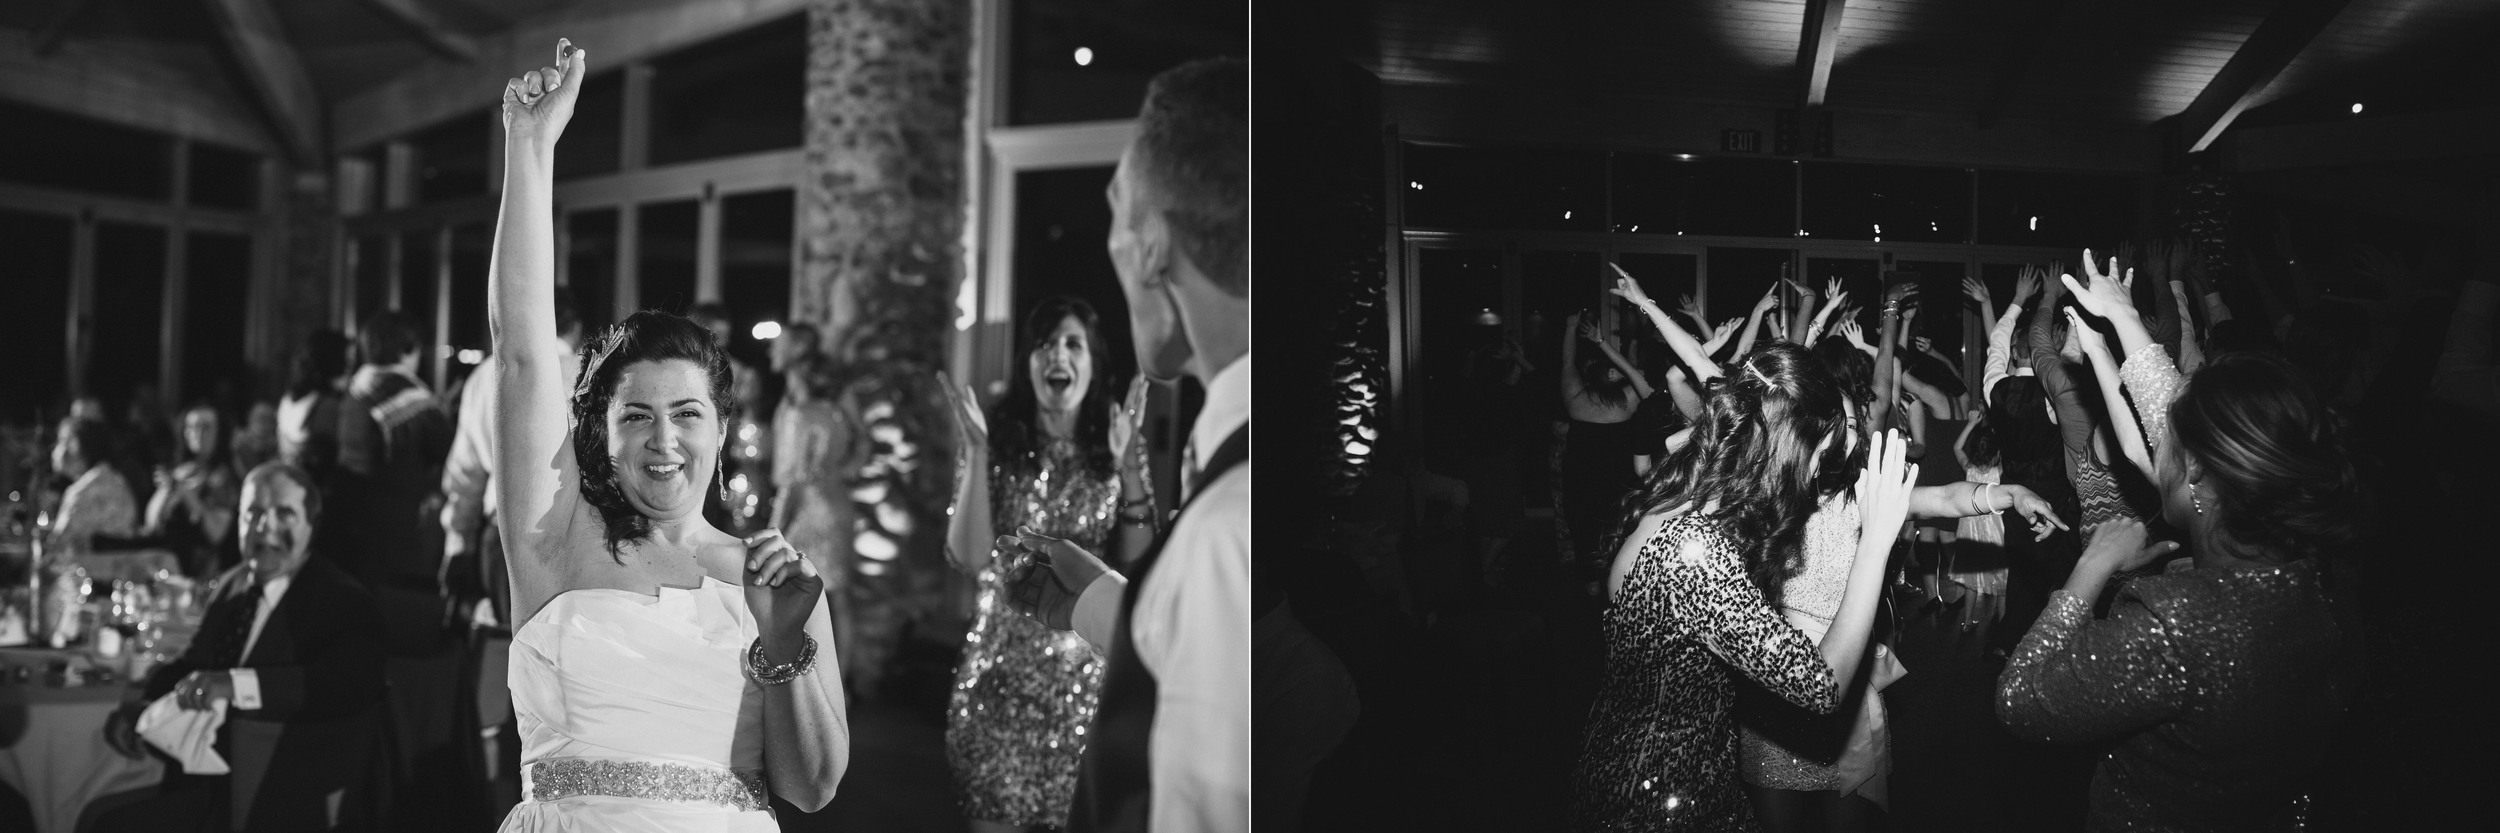 St Louis Wedding Photography-1069 copy.jpg